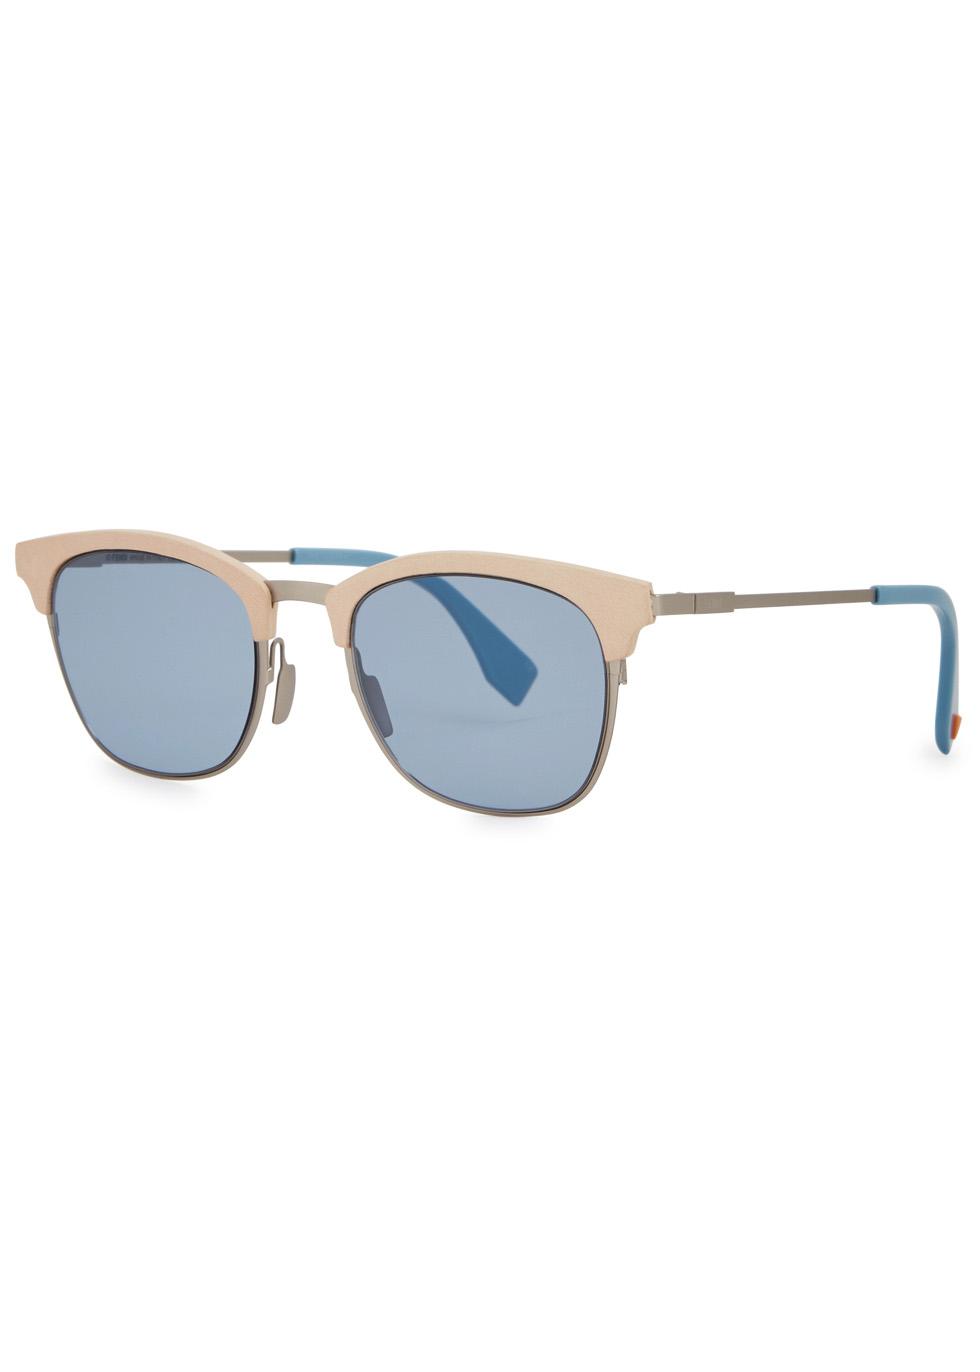 Blue clubmaster-style sunglasses - Fendi